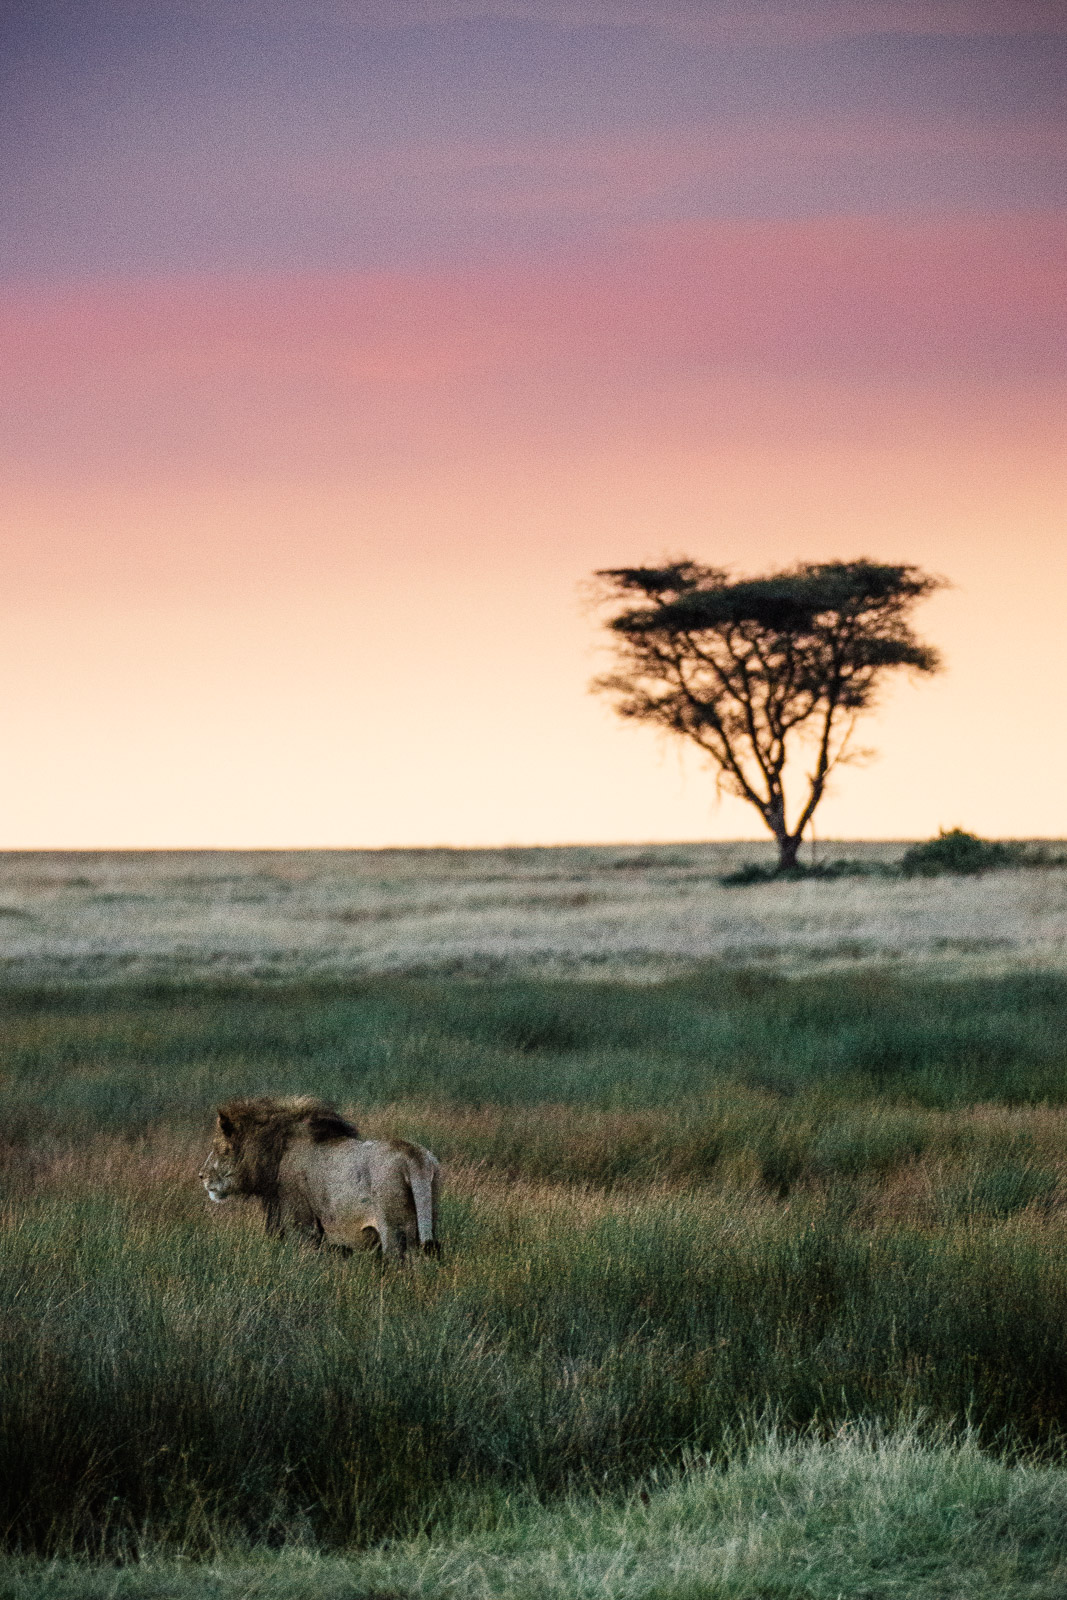 tanzania-africa-travel-photos-adventure-safari-8.jpg